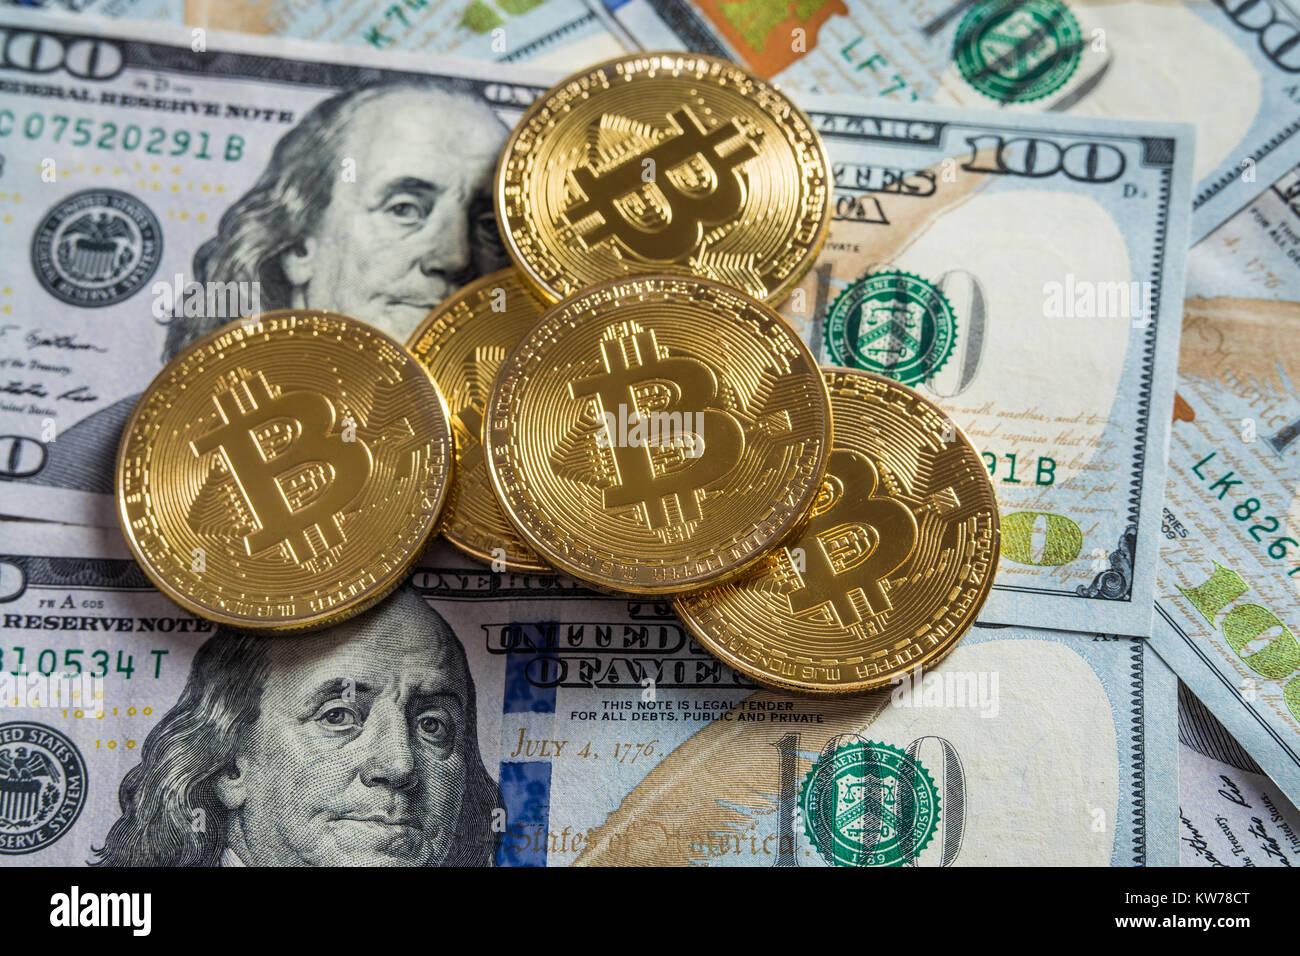 bitcointalk hitbtc